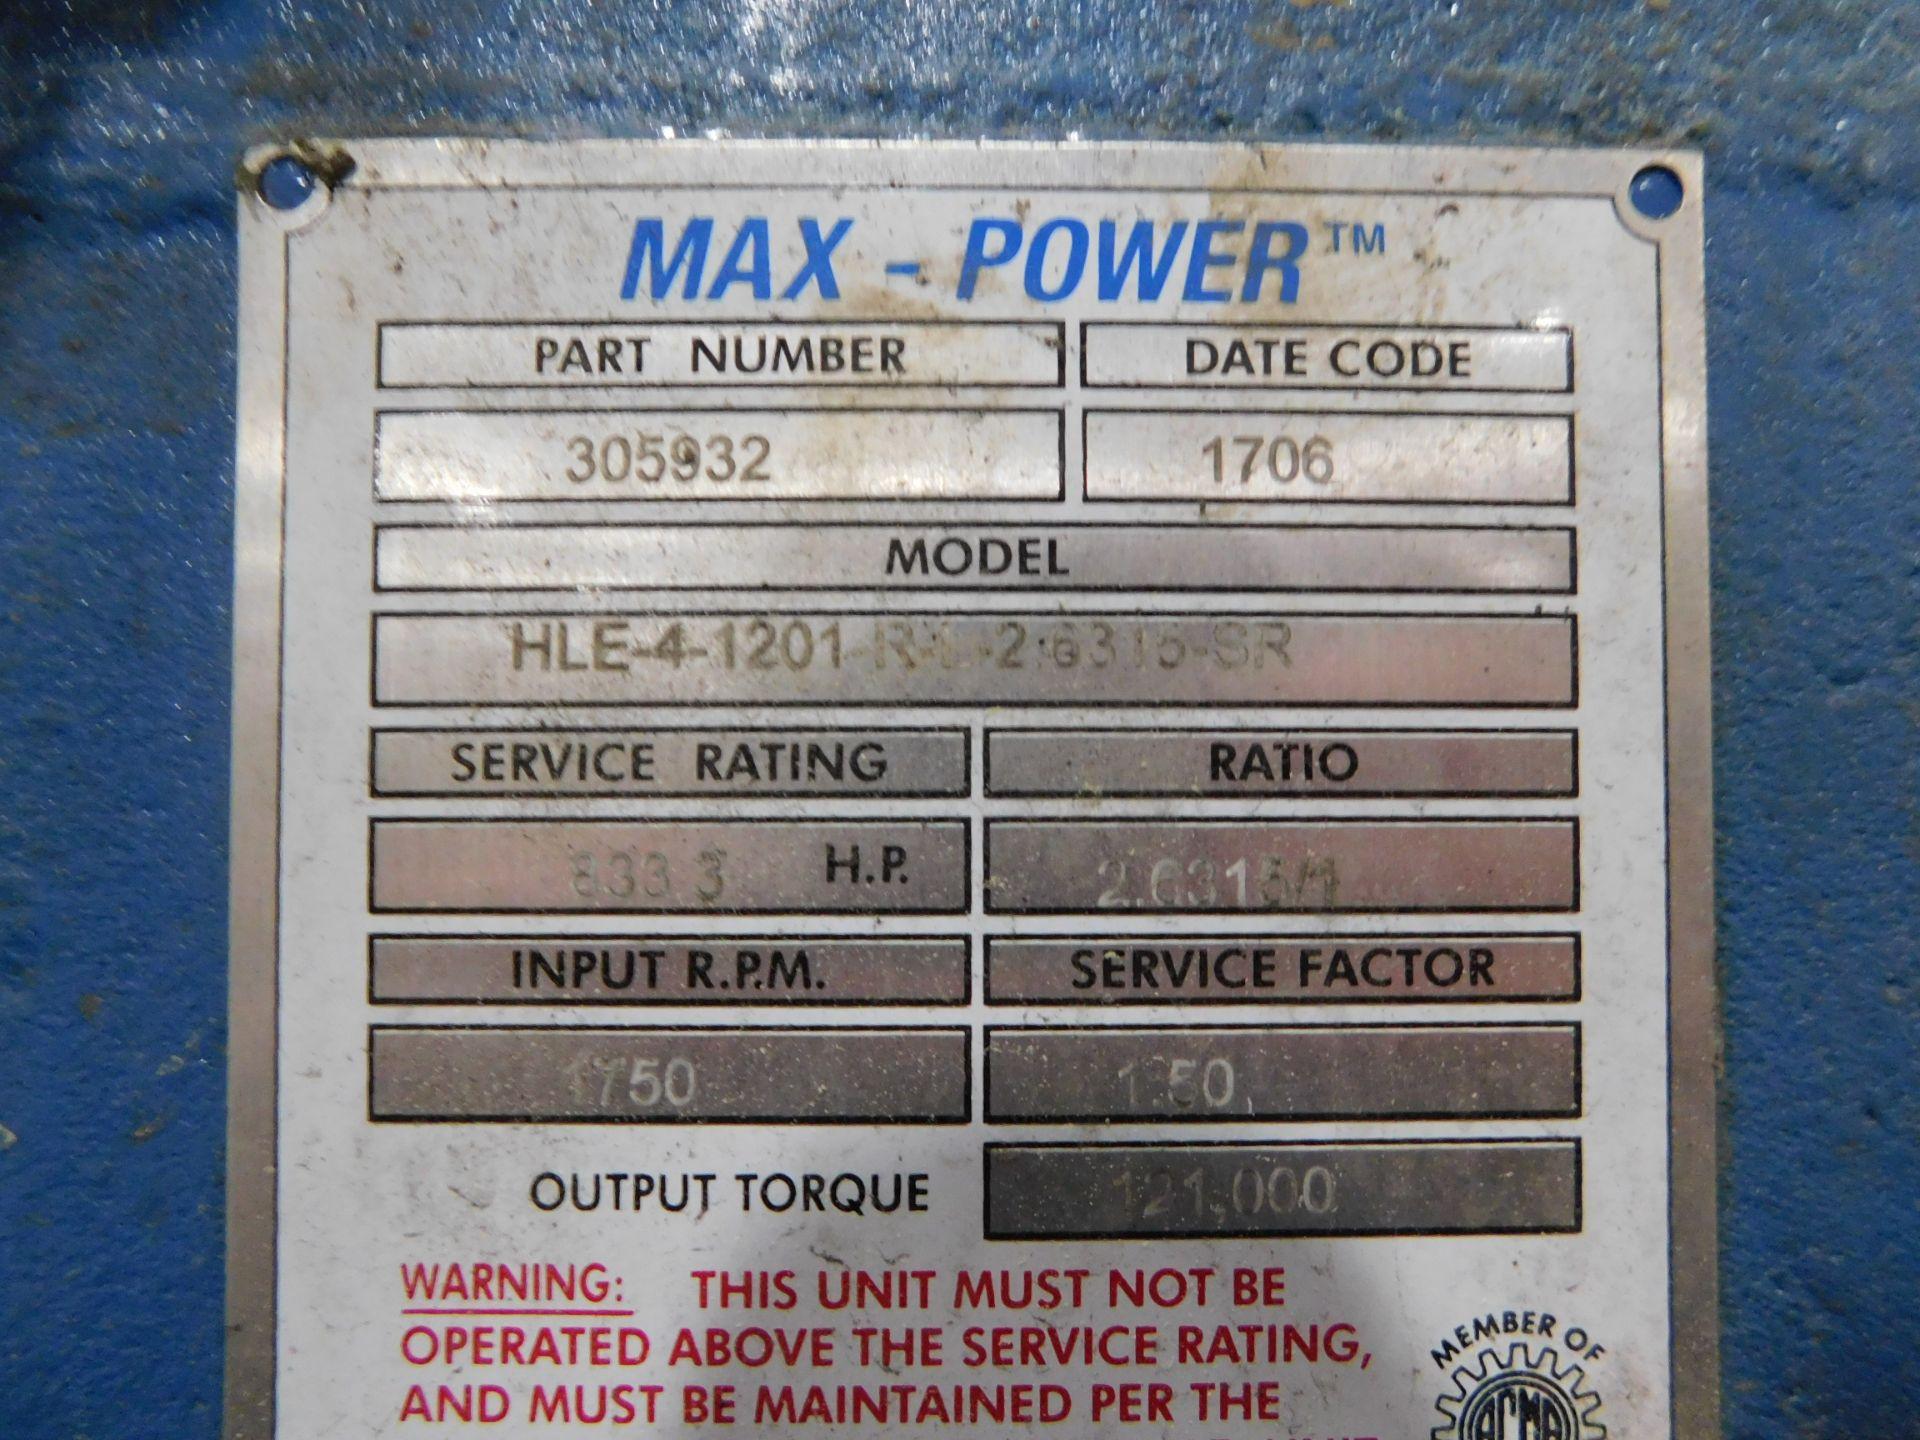 Reliance AC Duty Master Motor. 900 HP. 3 Ph. 60 Hz. 4160 V. 1789 RPM. 6809S. Type P. - Image 9 of 10